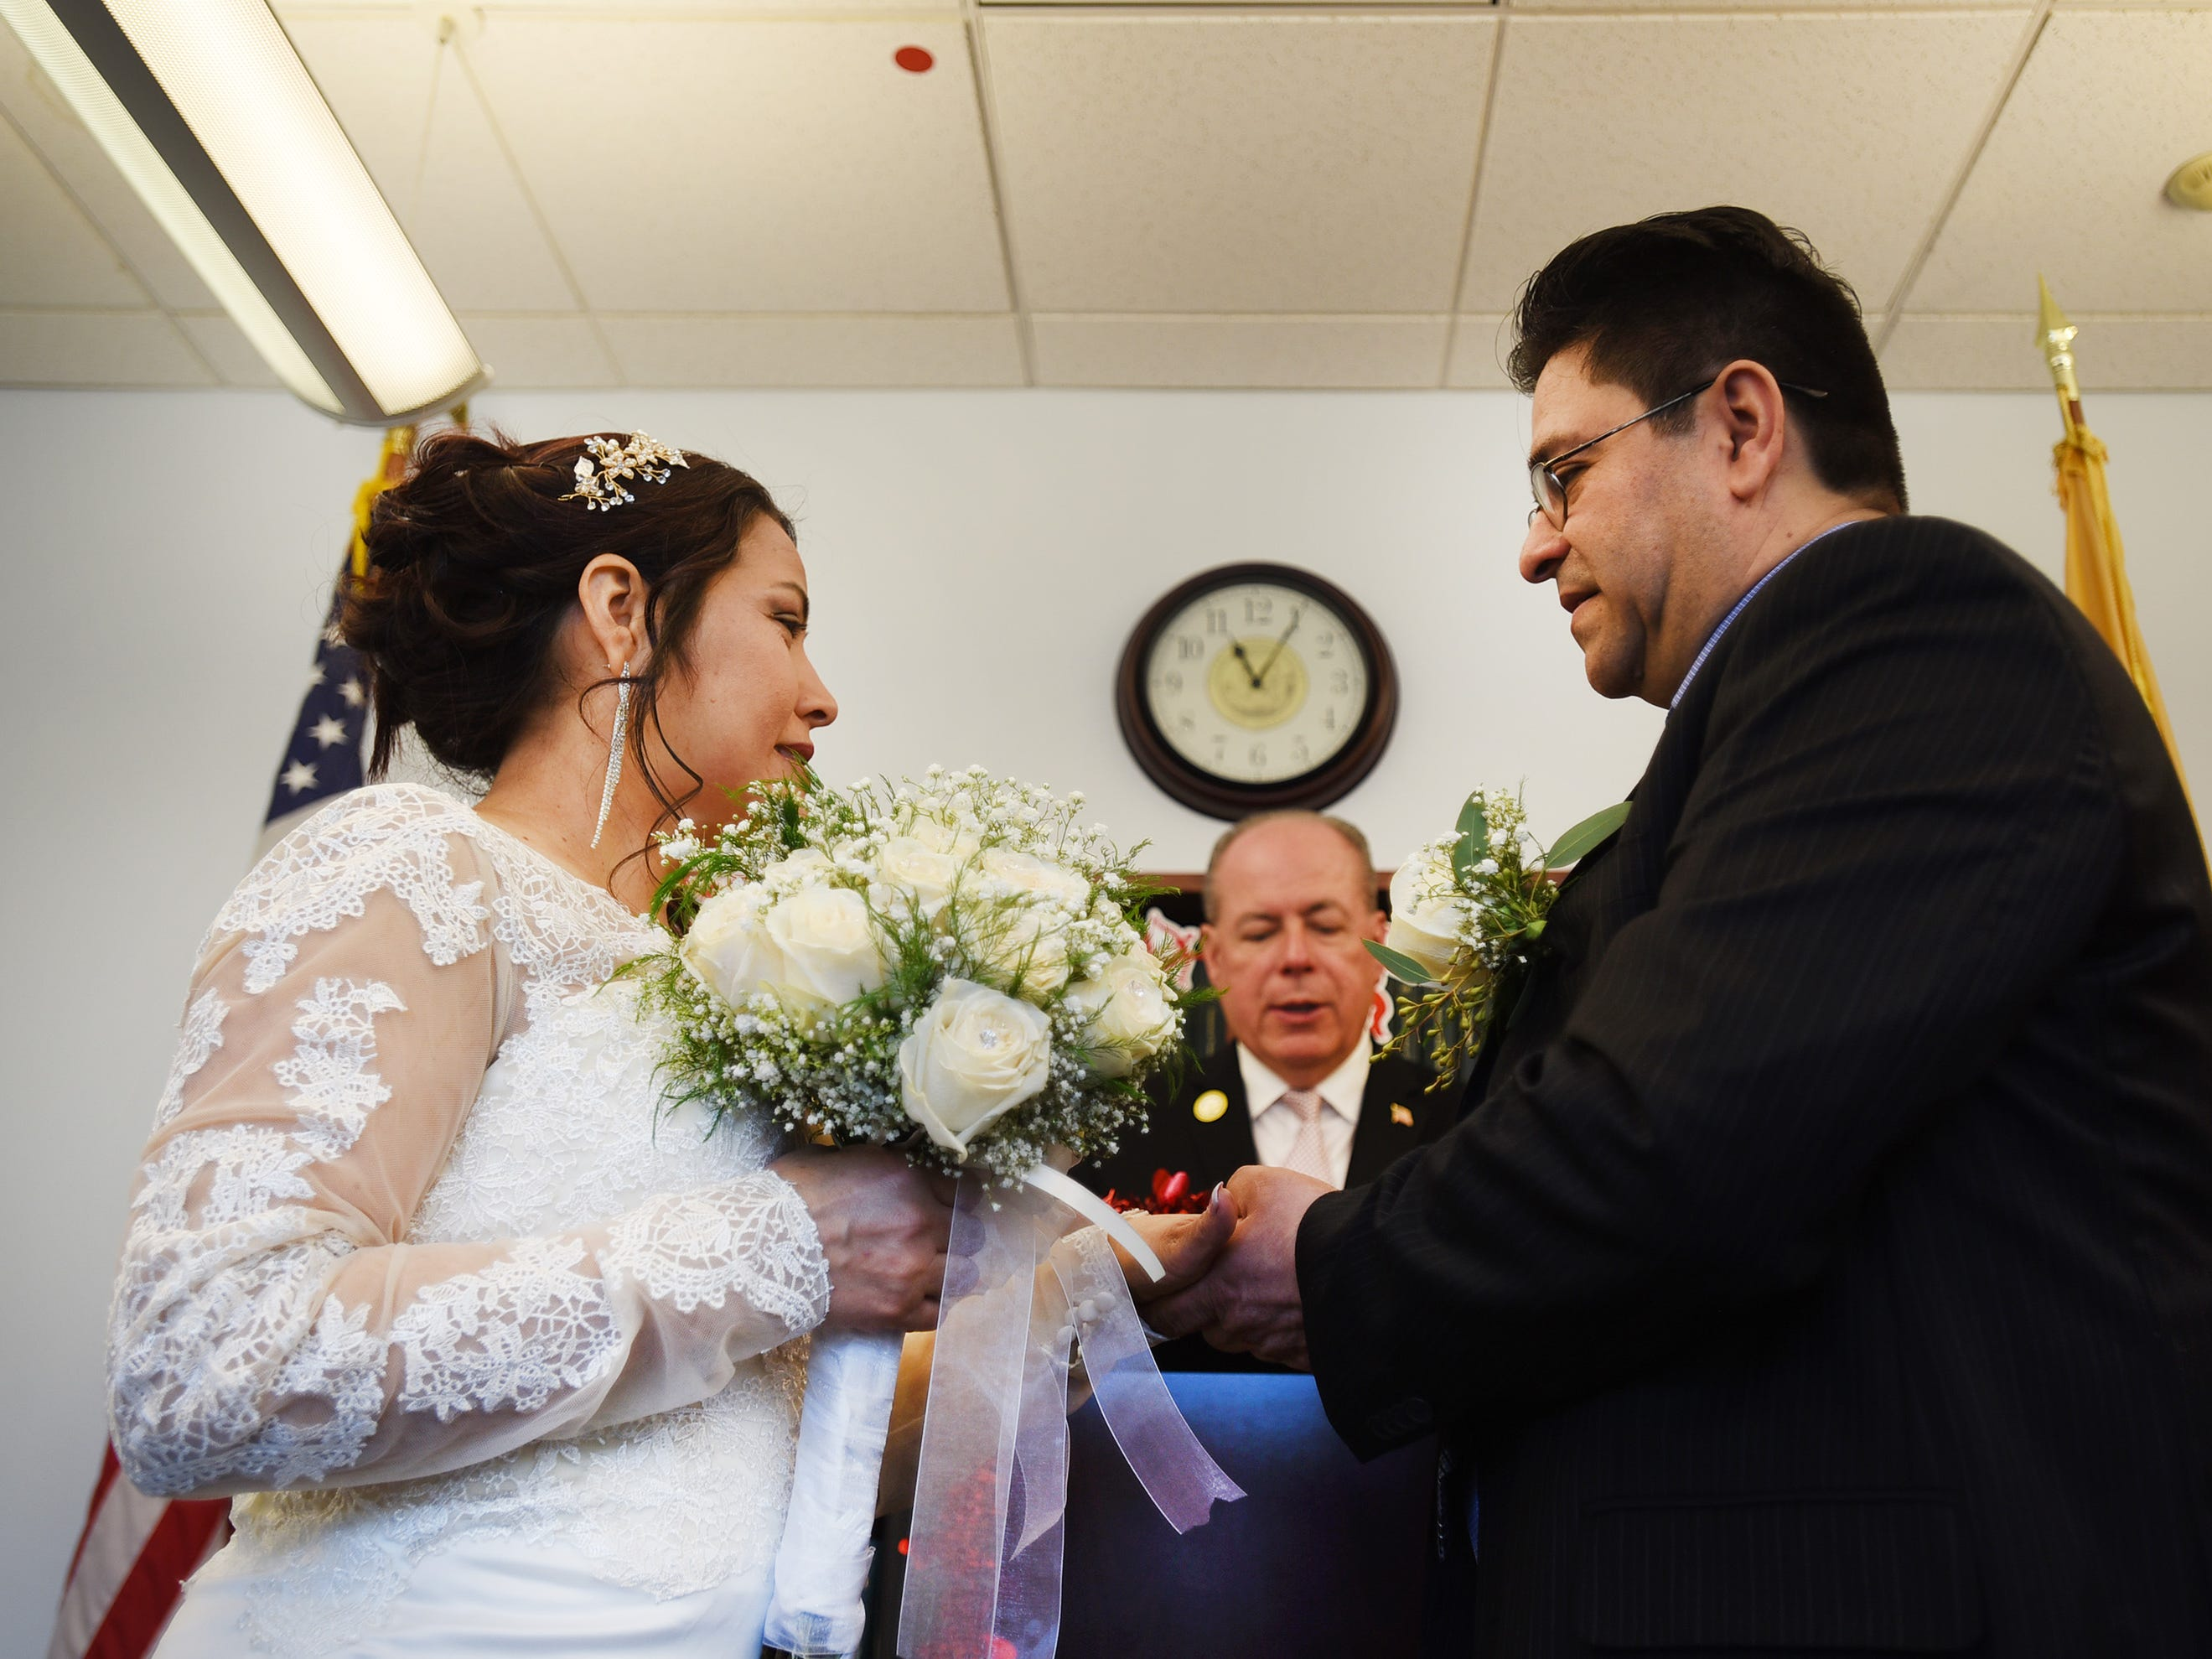 Bride and groom, Gloria Gallego and Alexander Gutierrez of Englewood, exchange their wedding rings before Bergen County Clerk John S. Hogan during their wedding ceremony, located at Bergen County Plaza in Hackensack on 02/14/19.